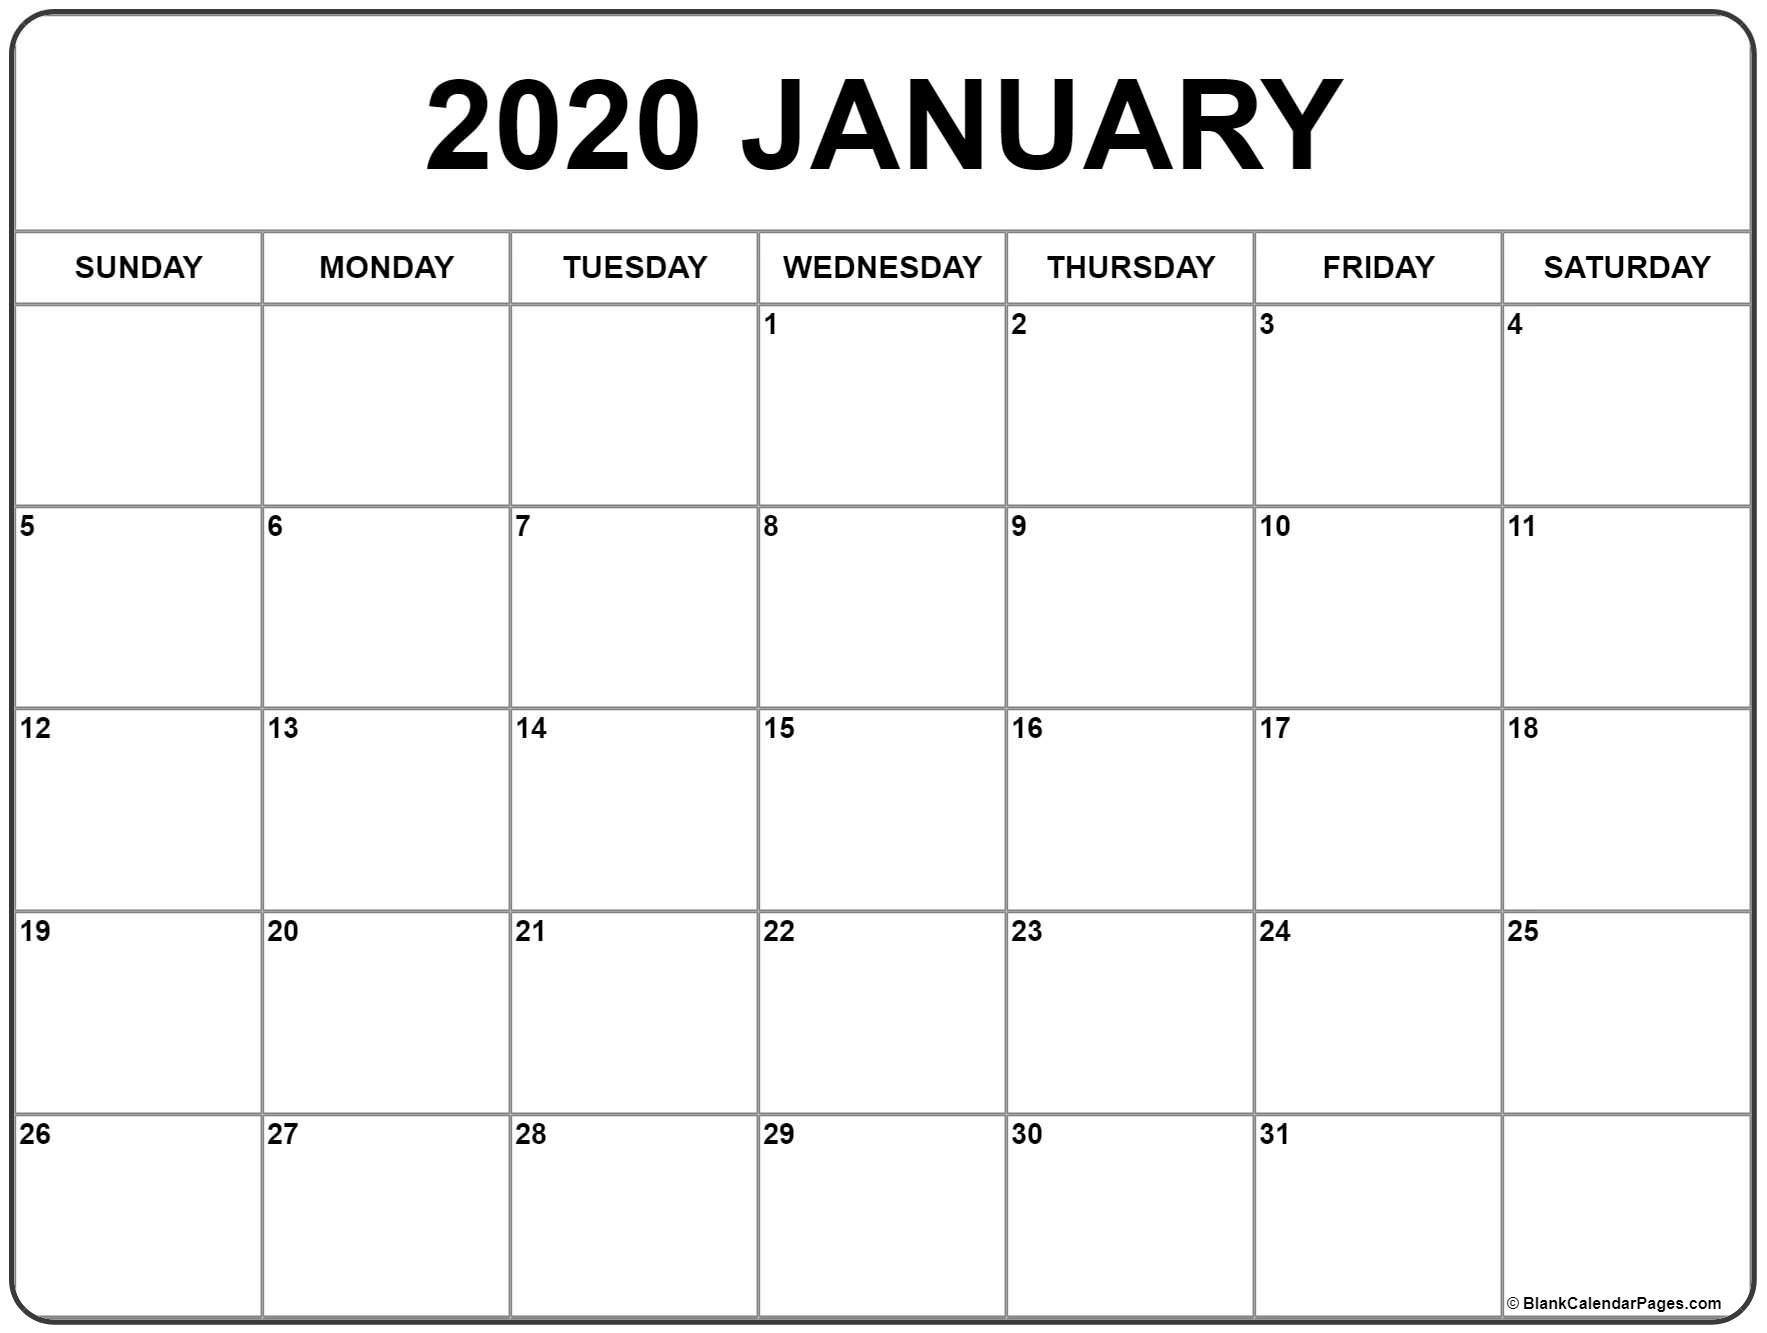 January 2020 Calendar | Free Printable Monthly Calendars-January 2020 Calendar Word